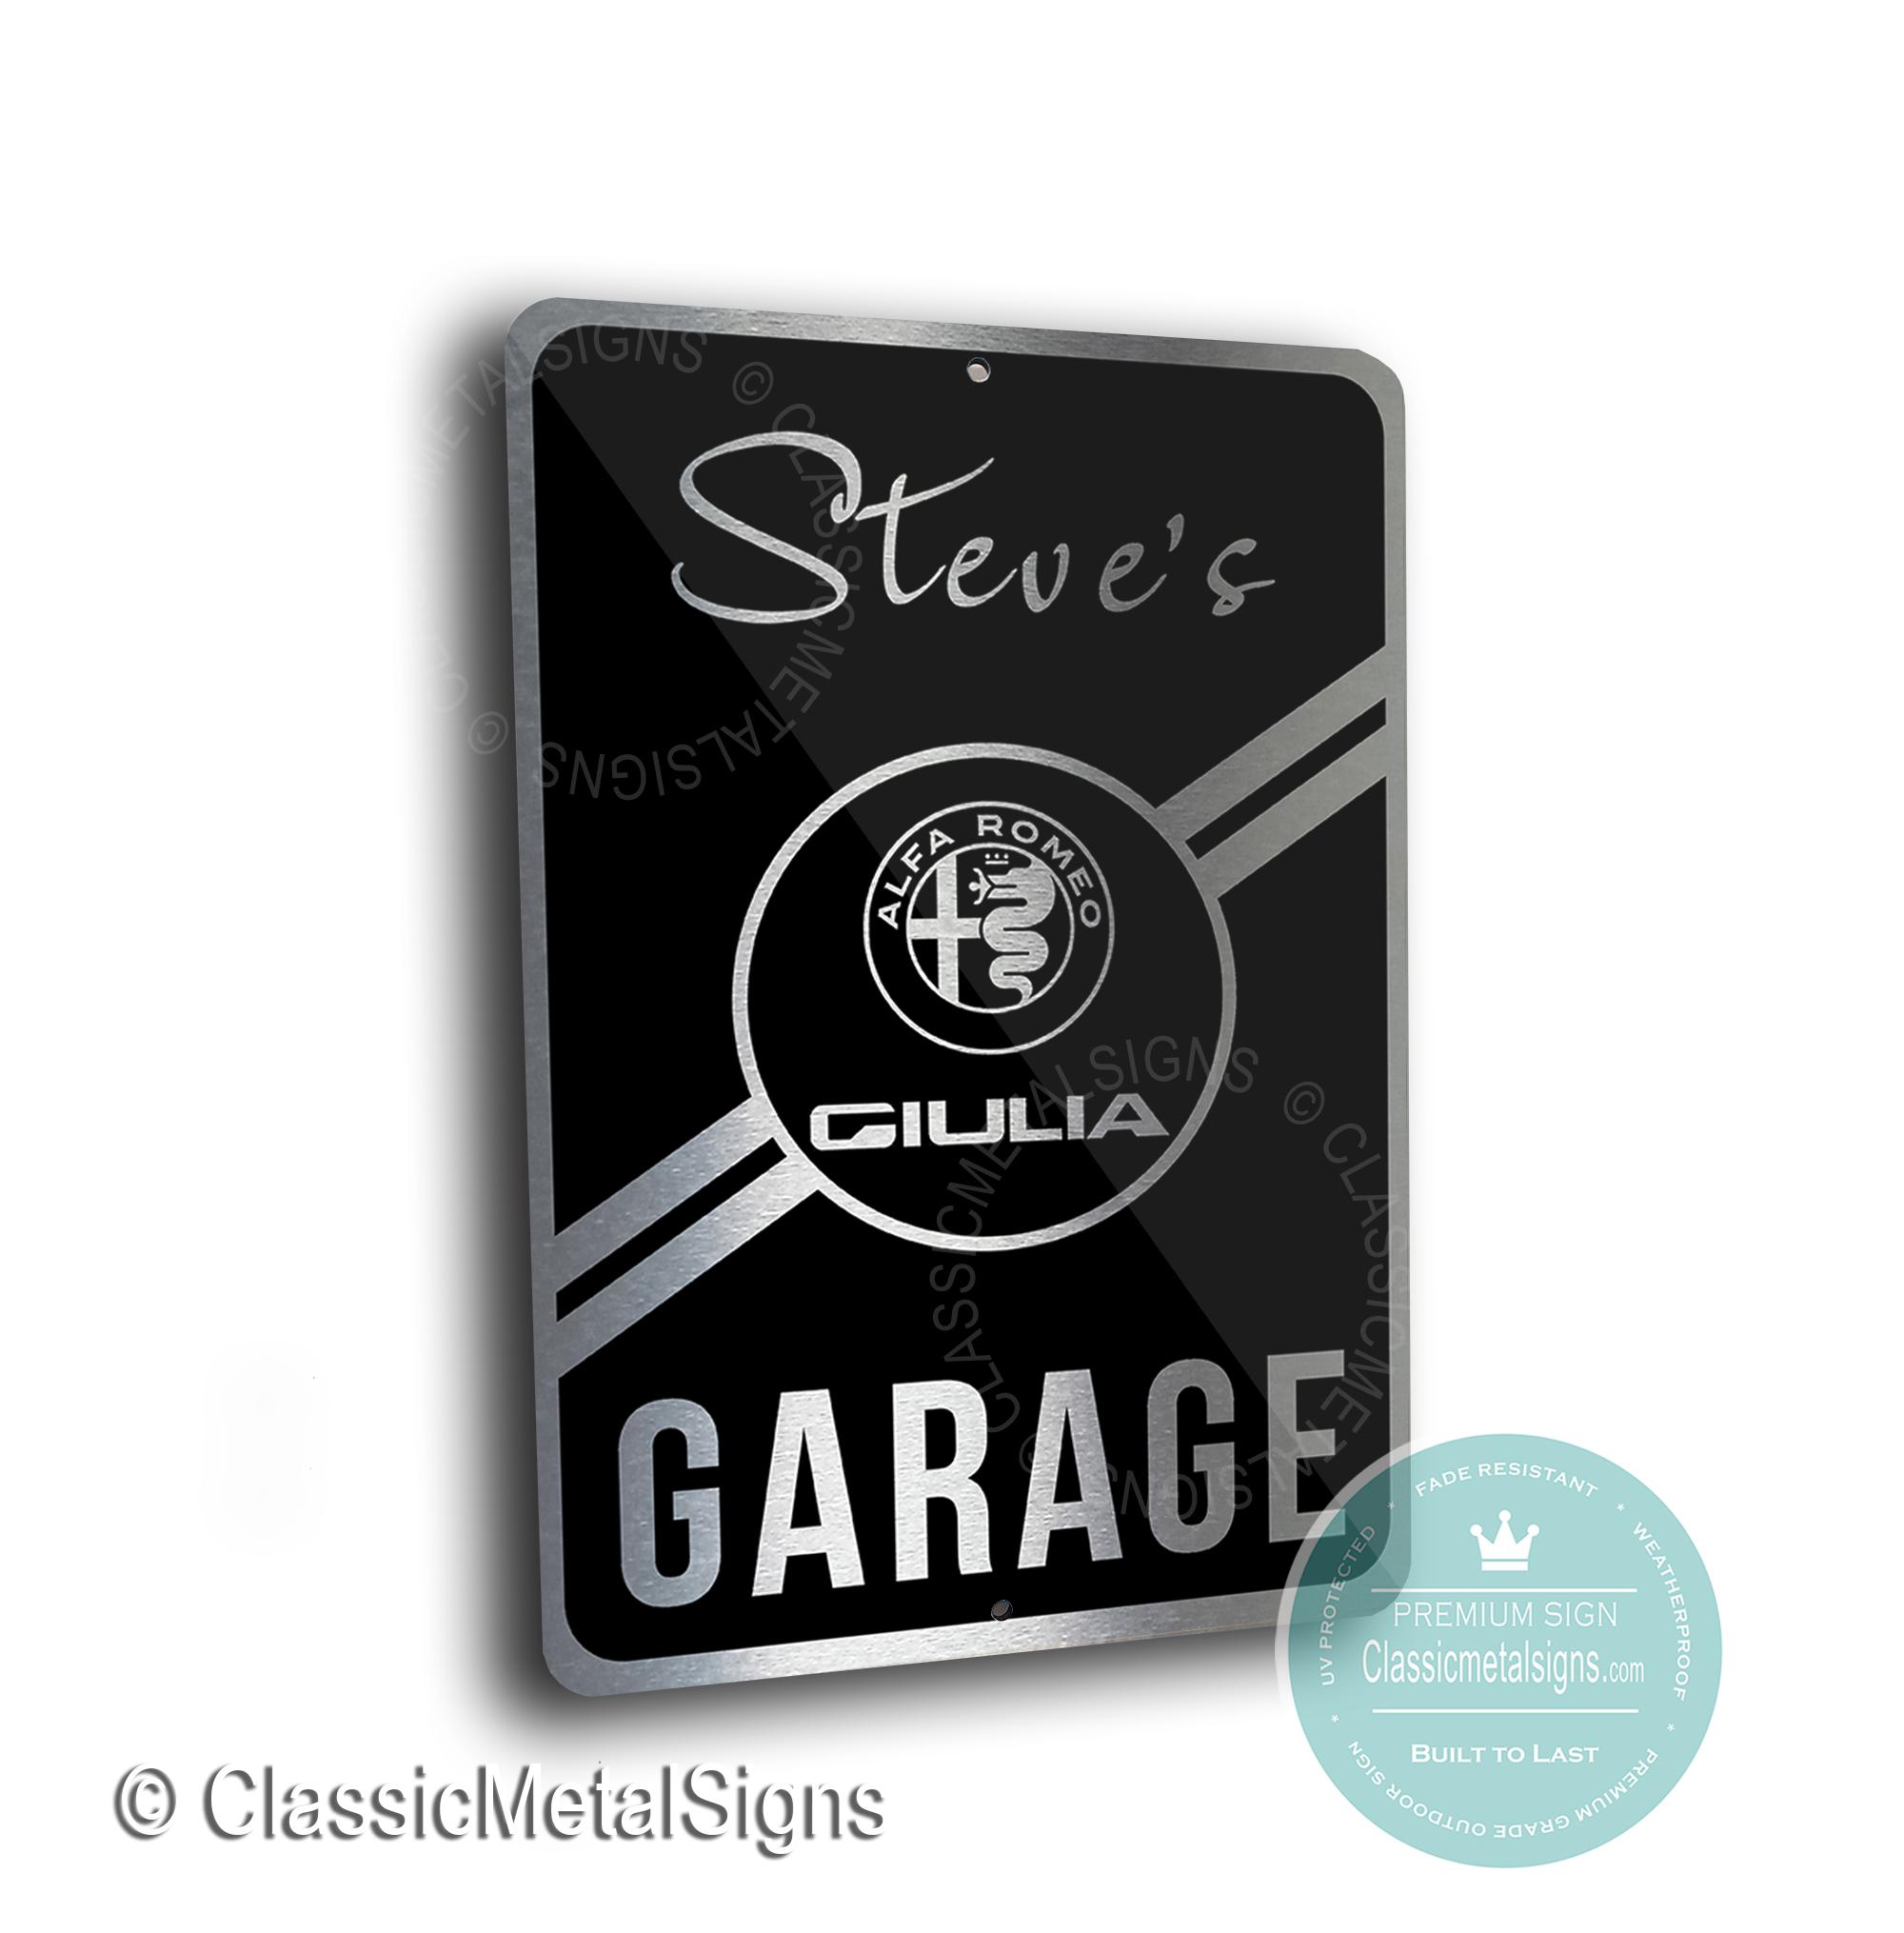 Alfa Romeo Giulia Garage Signs